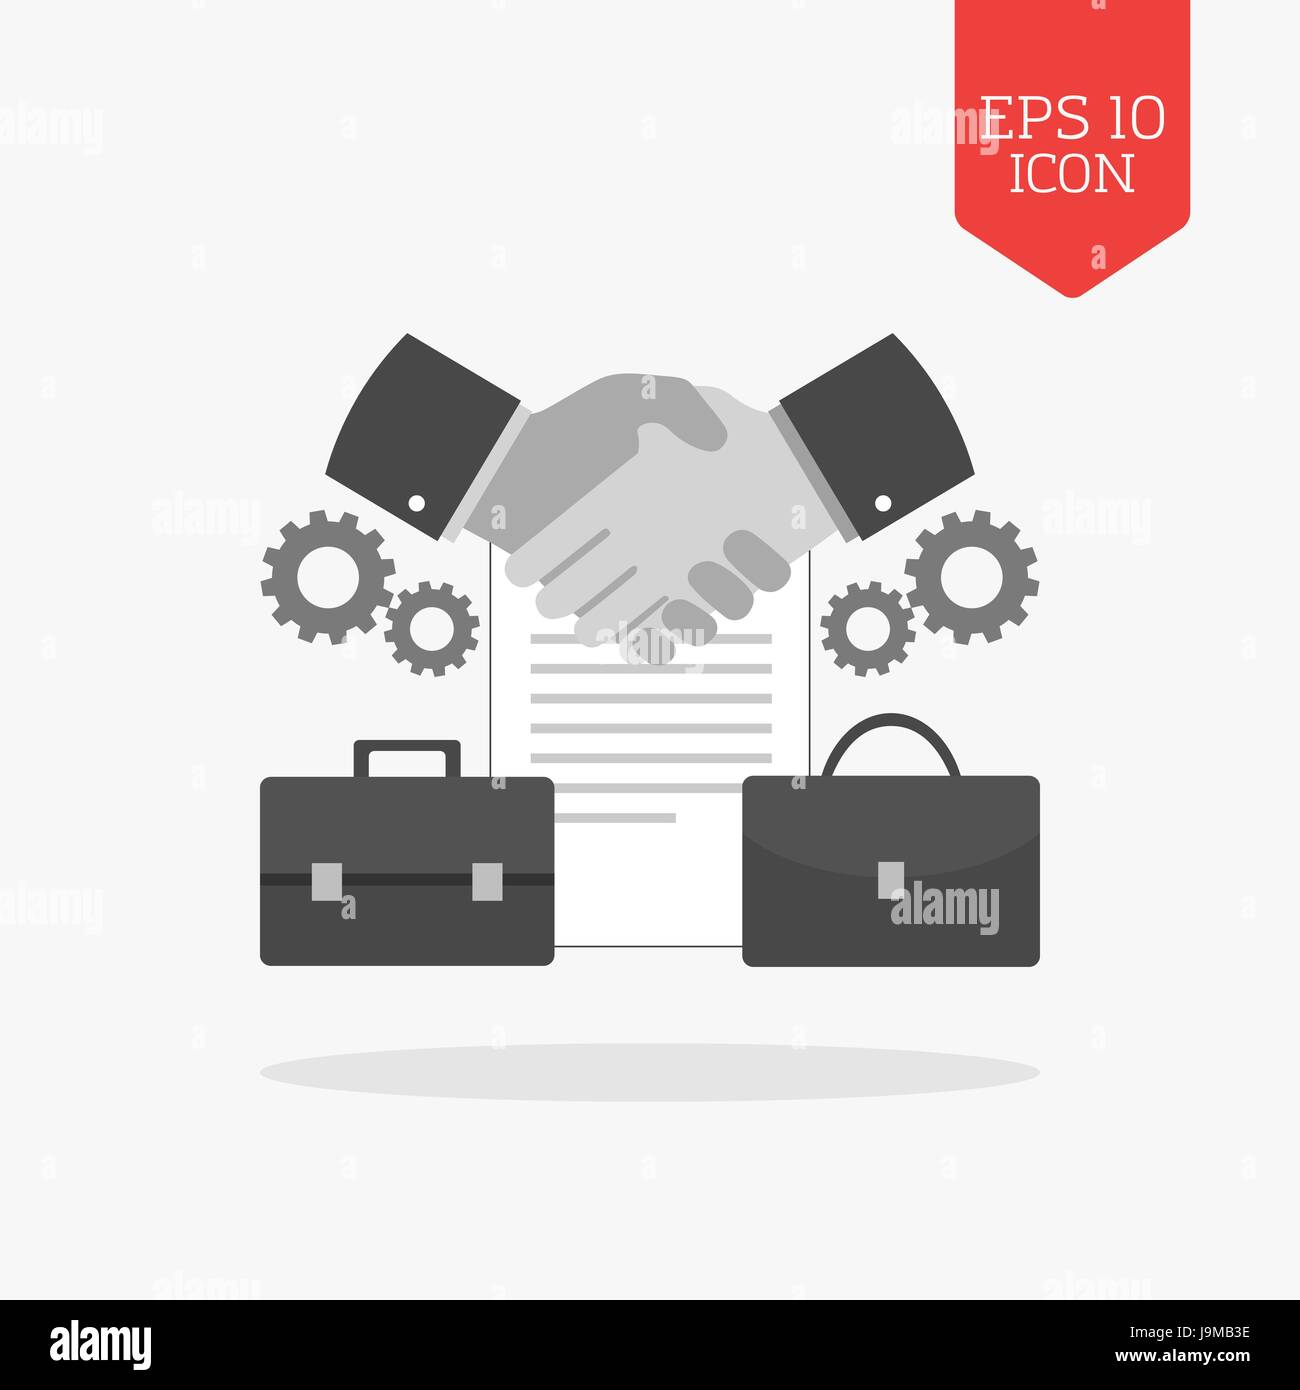 Handshake Abstract Logo Design Template Stockfotos & Handshake ...